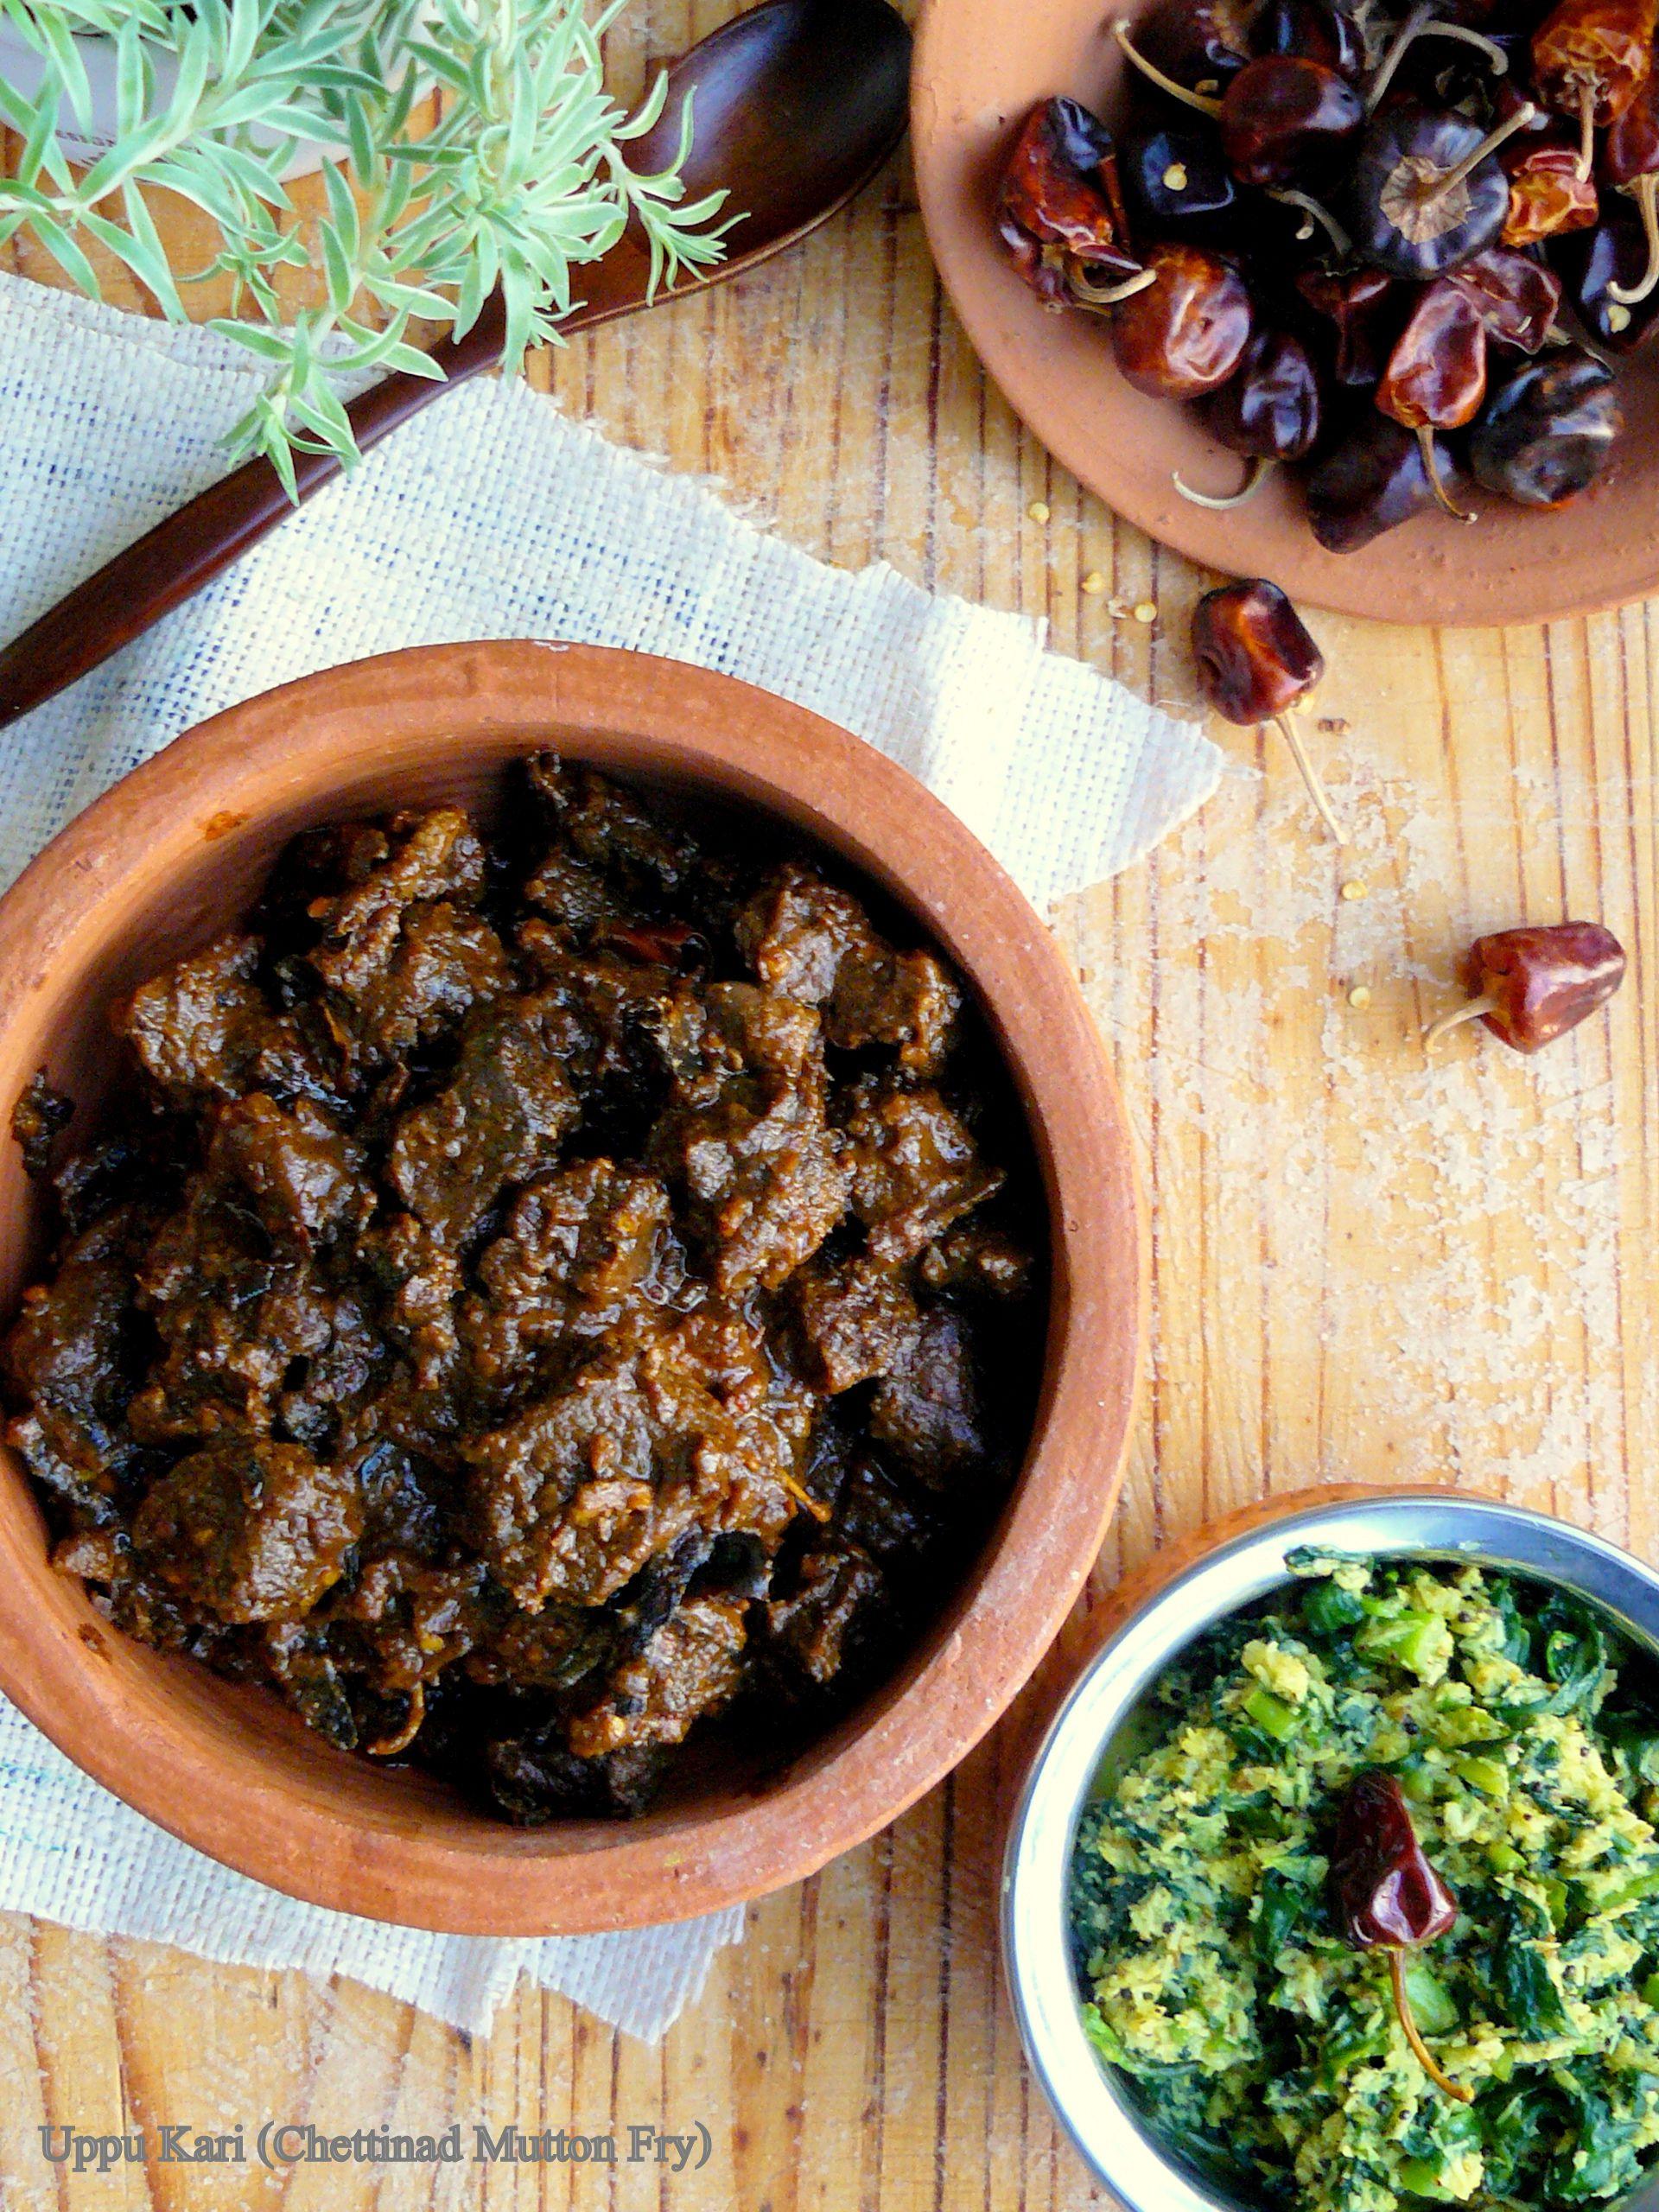 Uppu kari chettinad mutton fry thespiceadventuress food recipes forumfinder Choice Image